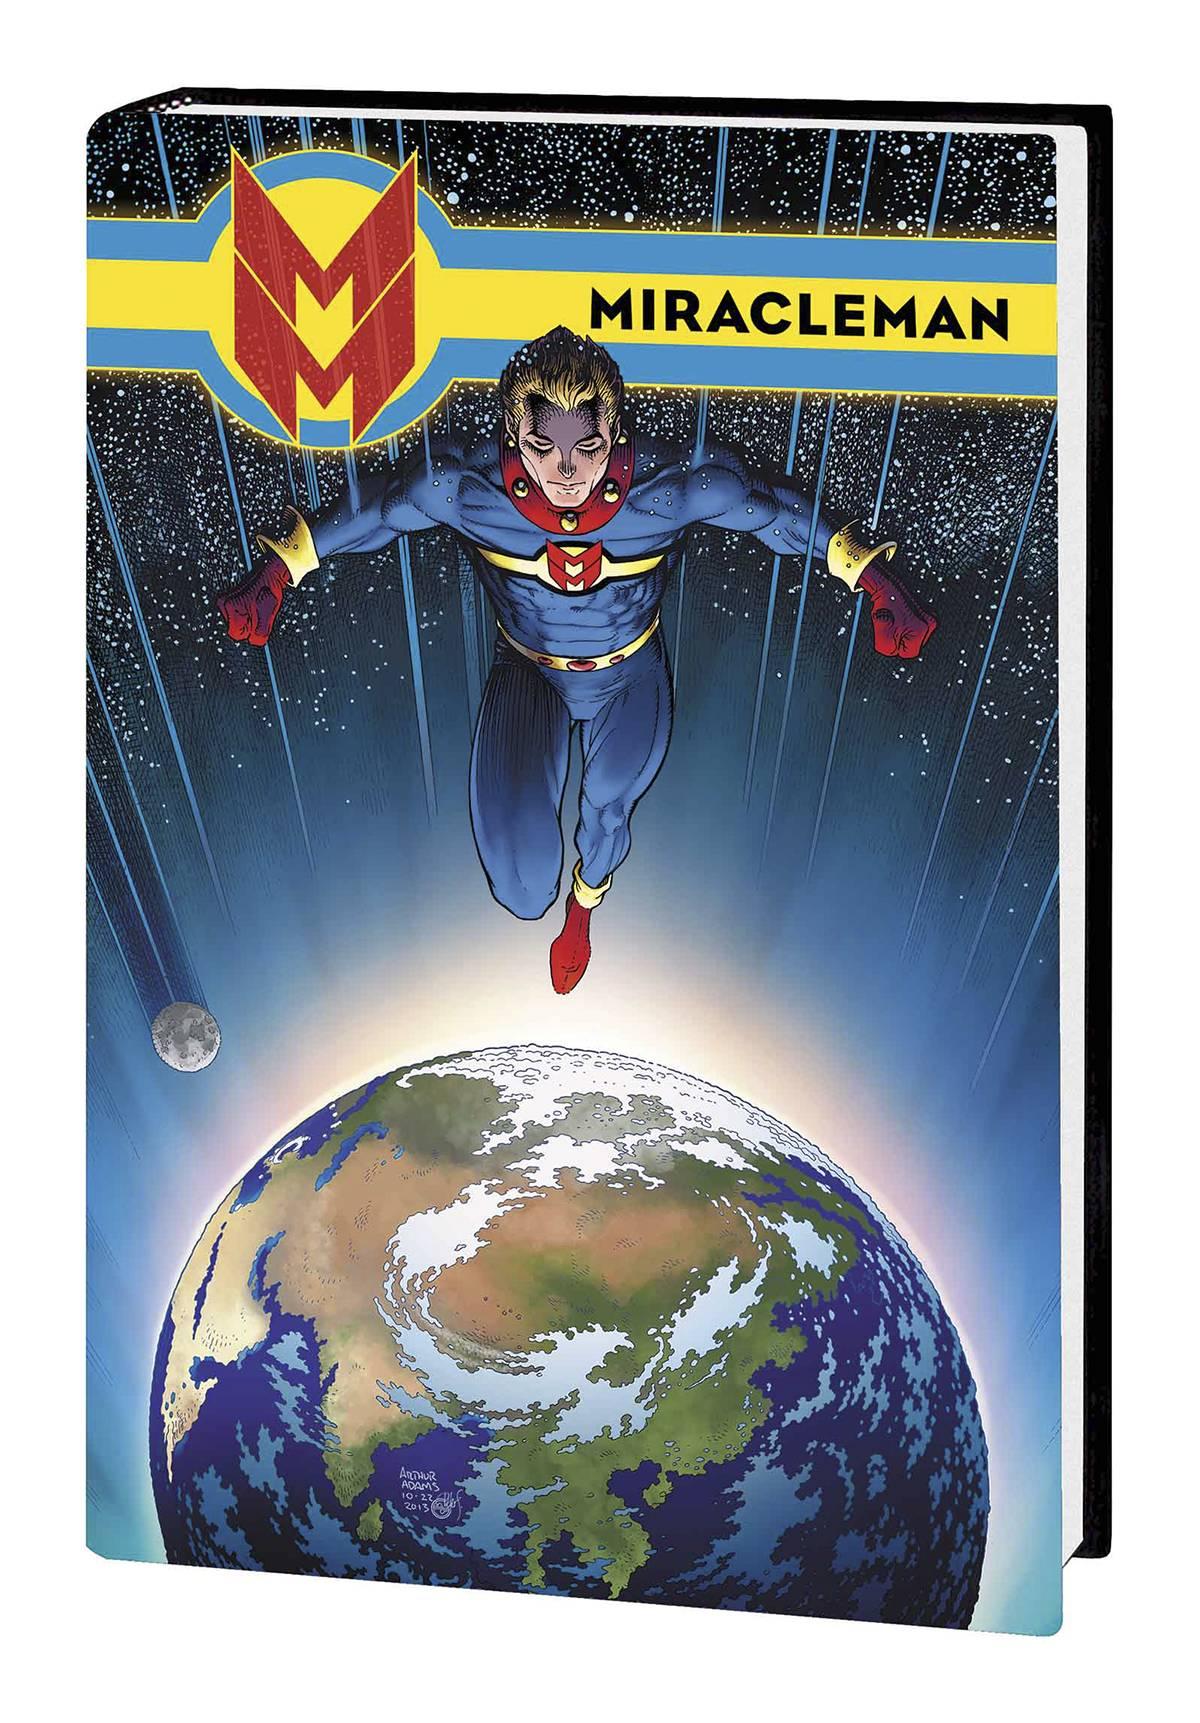 MIRACLEMAN PREM HC BOOK 03 OLYMPUS DM TOTLEBEN VAR ED (MR)